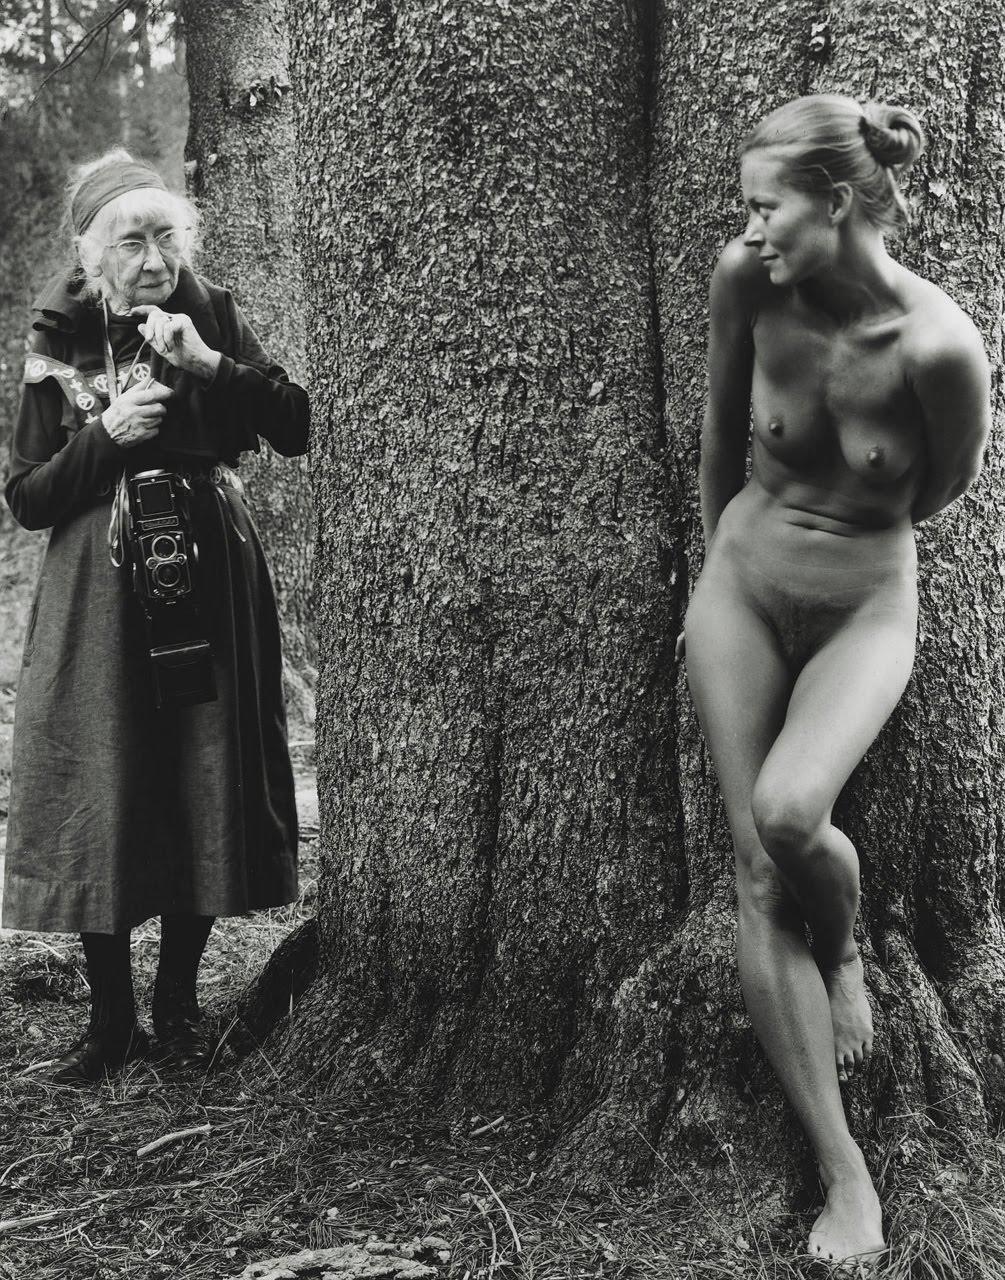 http://4.bp.blogspot.com/_KMqOPeCgoT0/TSoQ_OIjn7I/AAAAAAAAKTQ/uETk8bj_oqY/s1600/Imogen+Cunningham+and+Twinka+Thiebaud+by+Judy+Dater%2C+1974.jpg